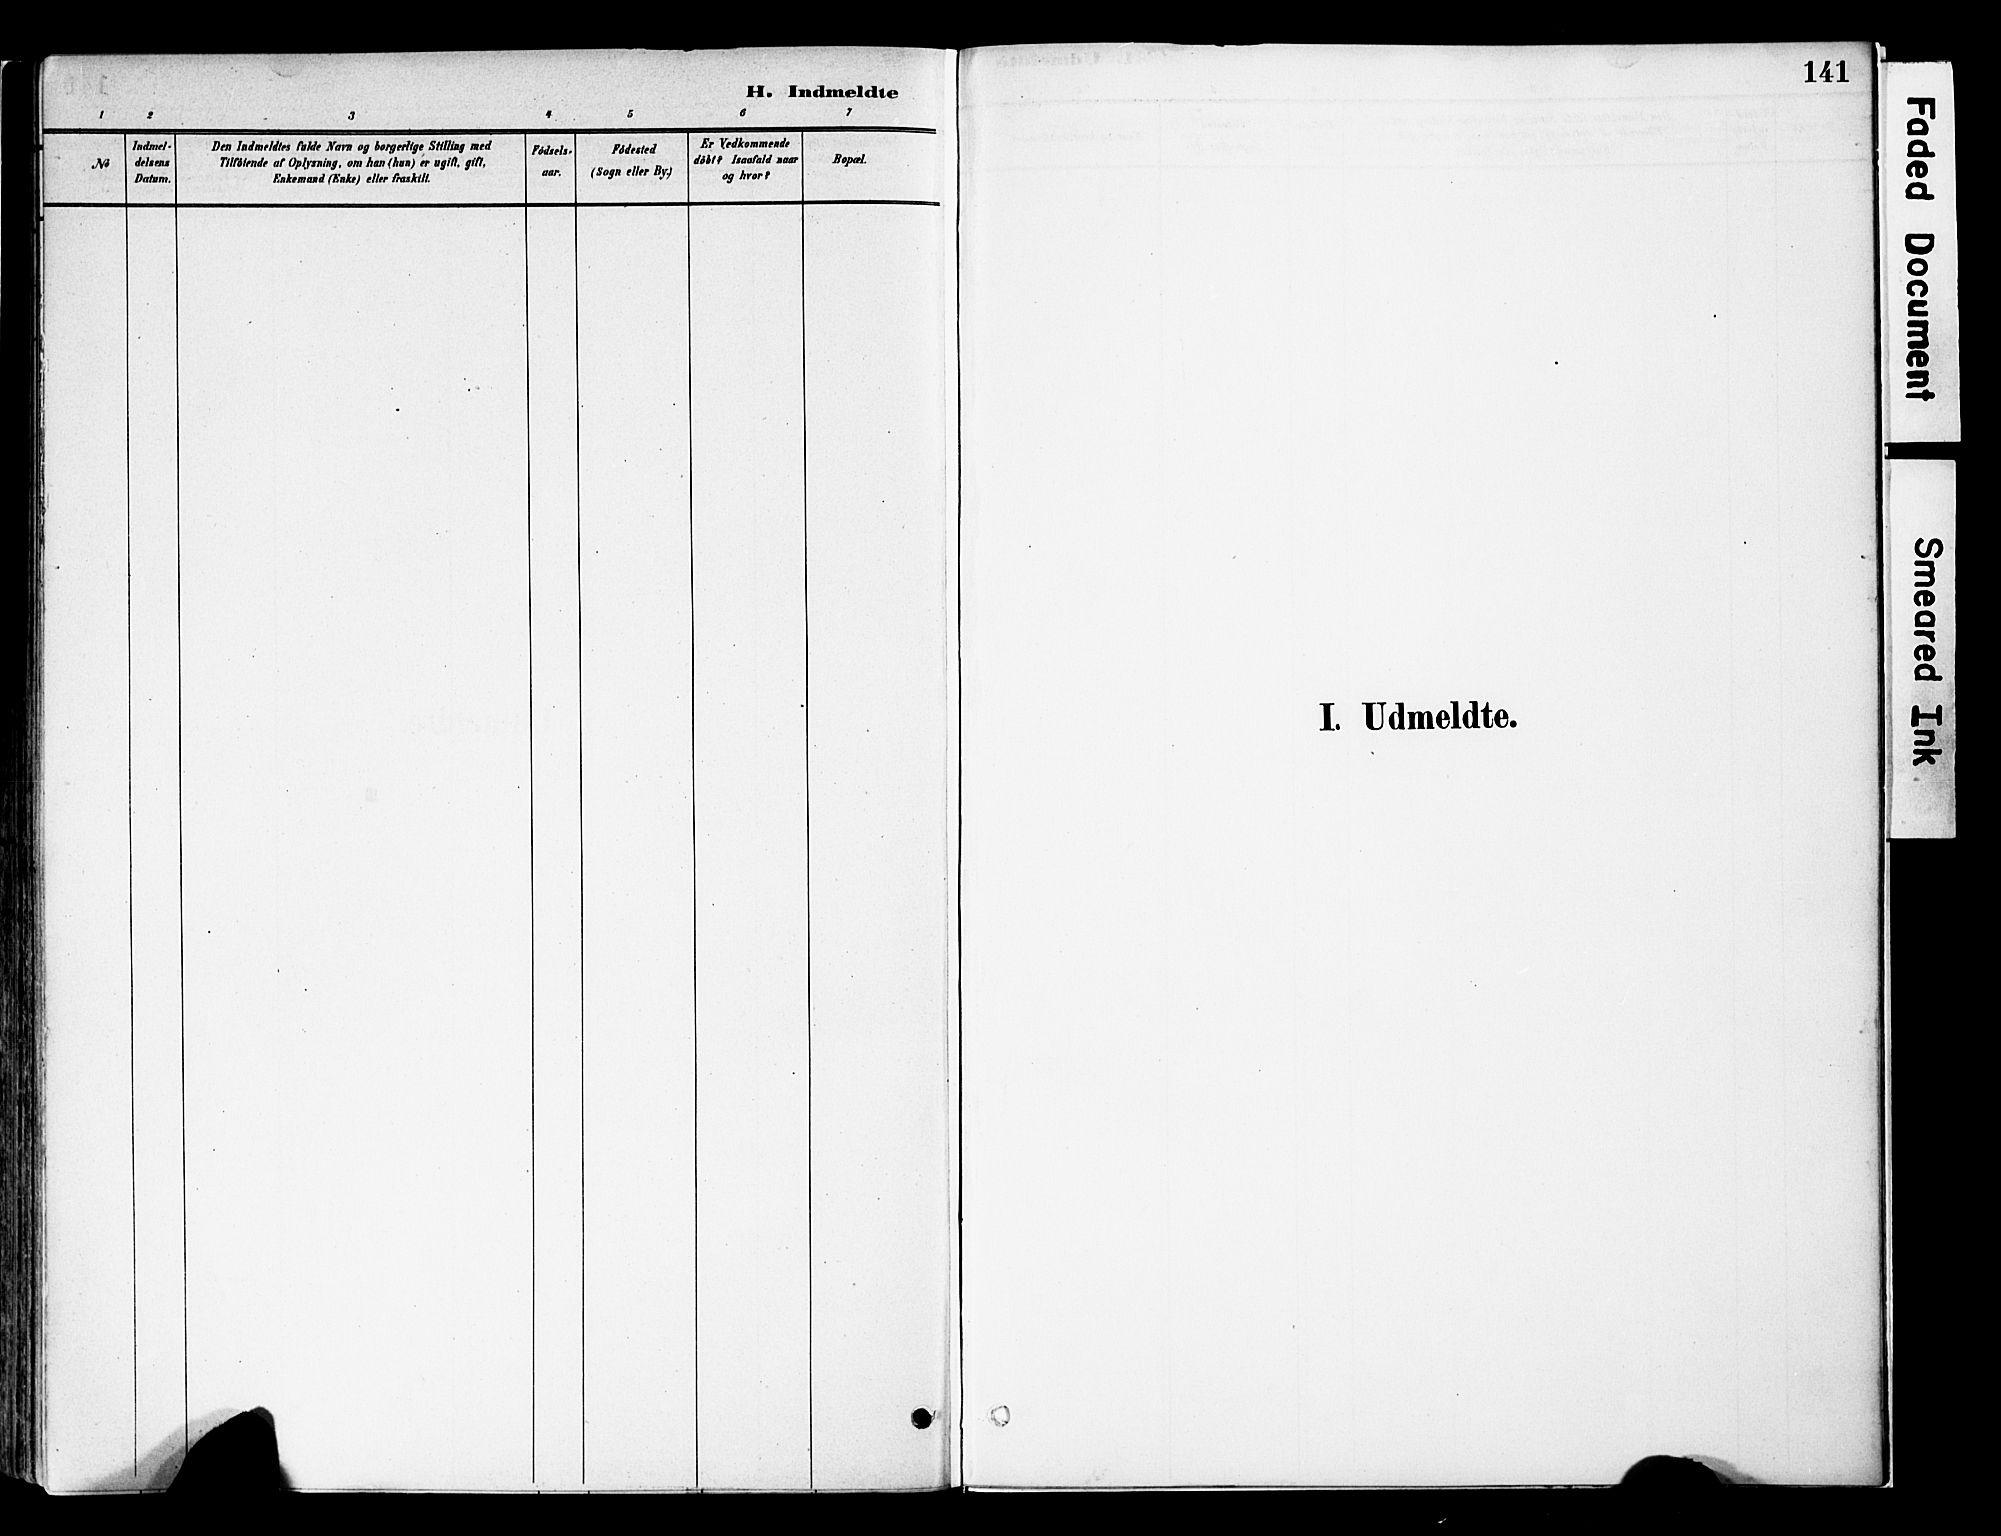 SAH, Vestre Slidre prestekontor, Ministerialbok nr. 5, 1881-1912, s. 141